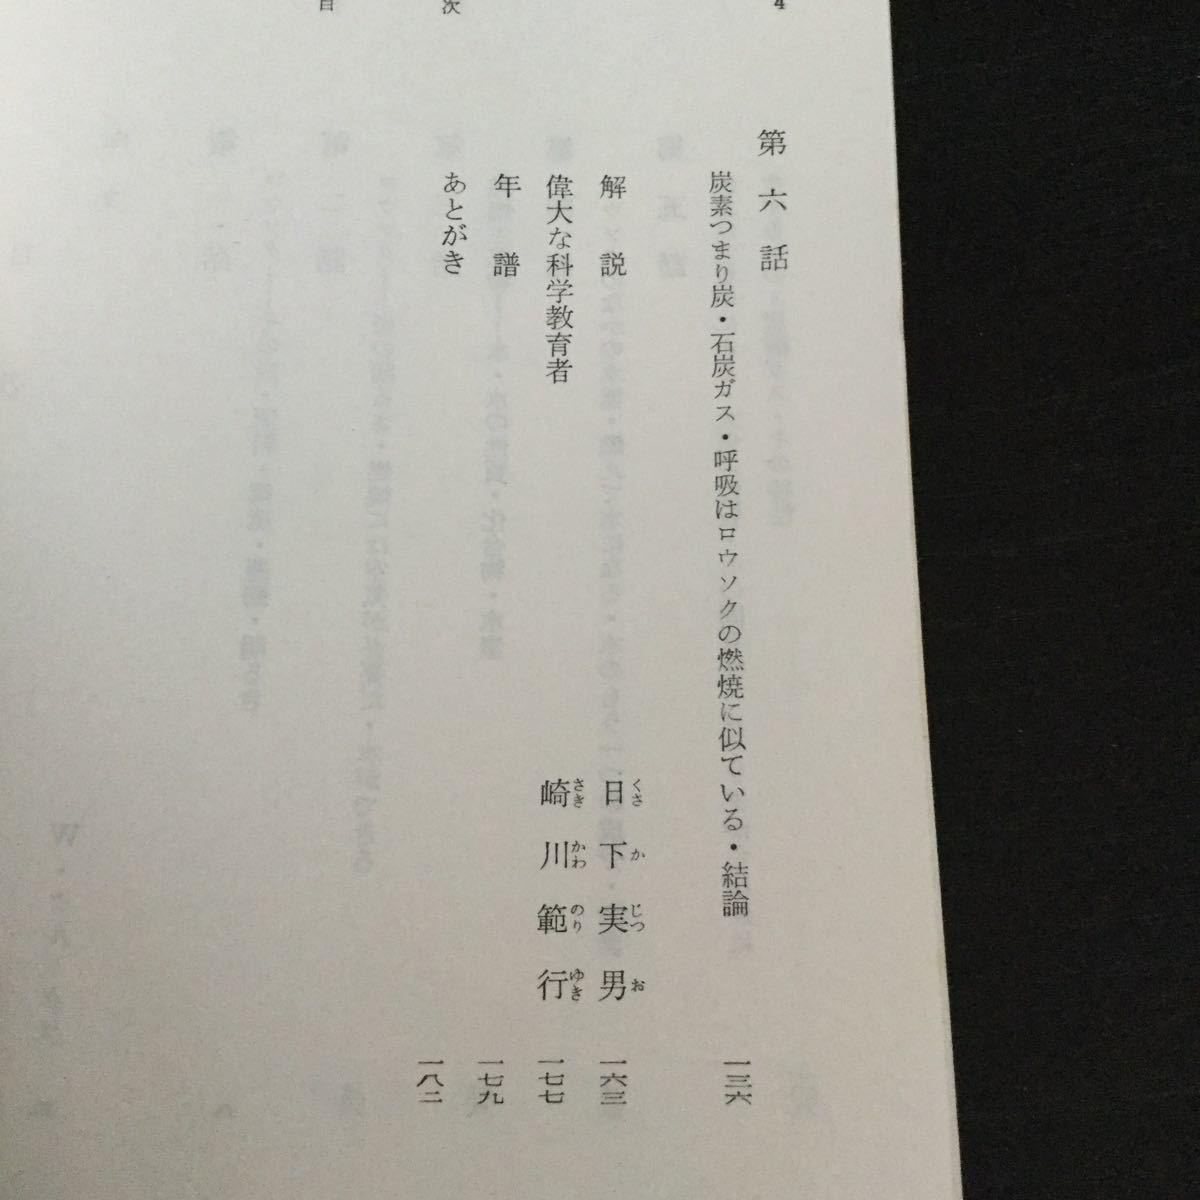 a37 ロウソクの科学 ファラデー 日下実男 小説 旺文社文庫 旺文社 _画像5